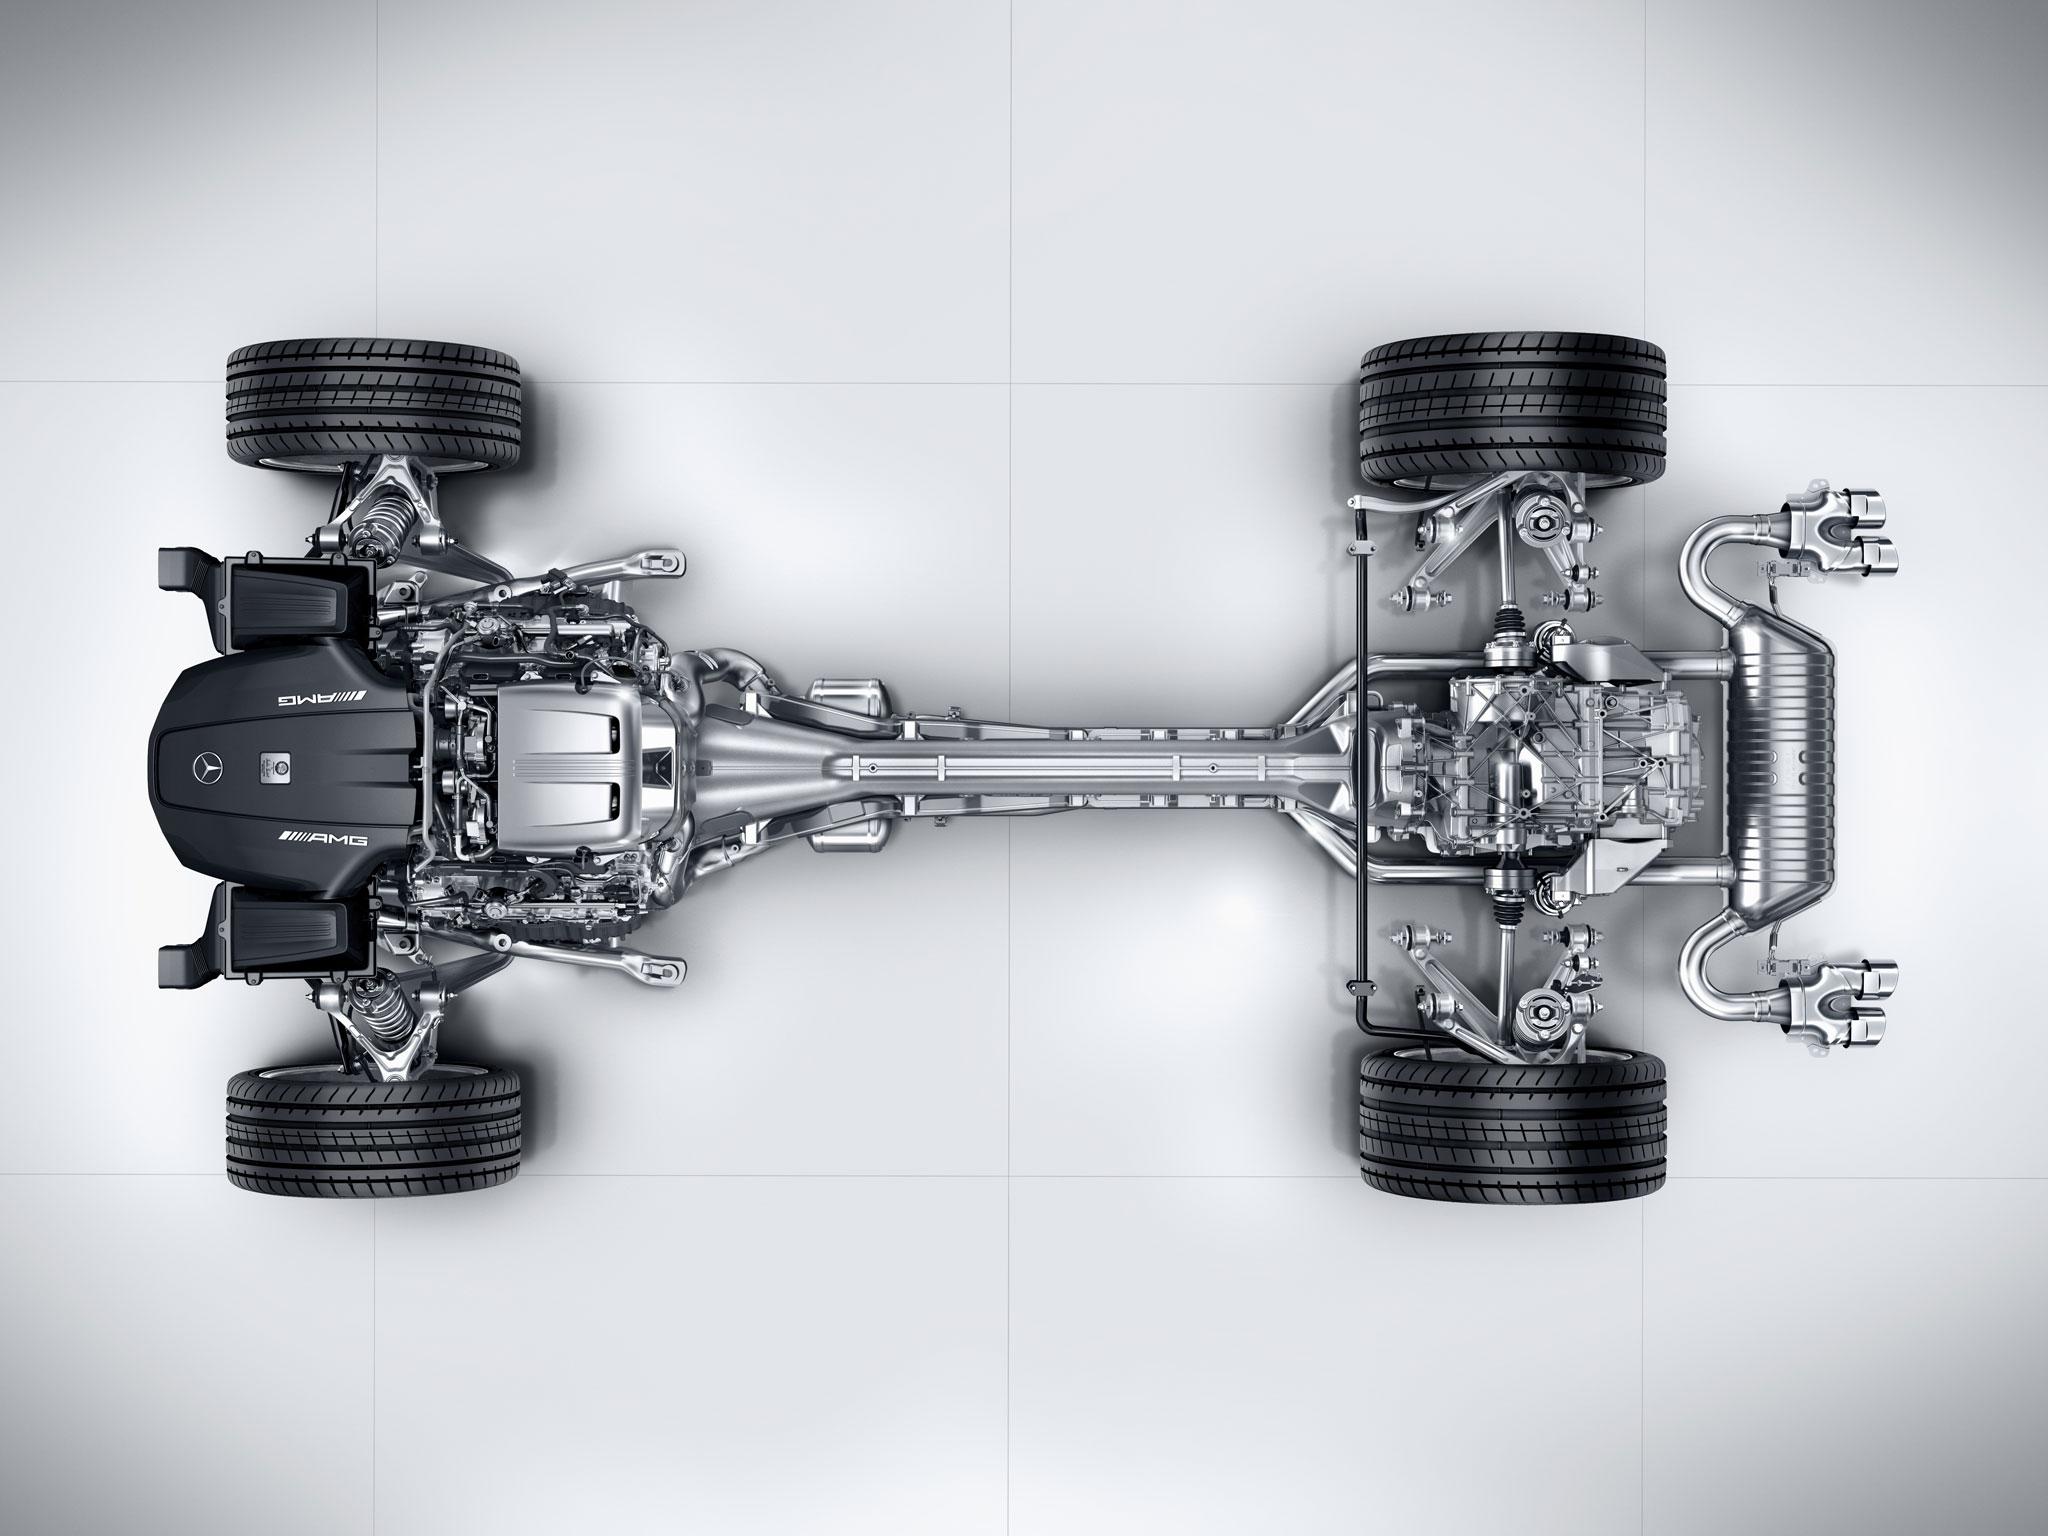 AMG GT Drivetrain overhead